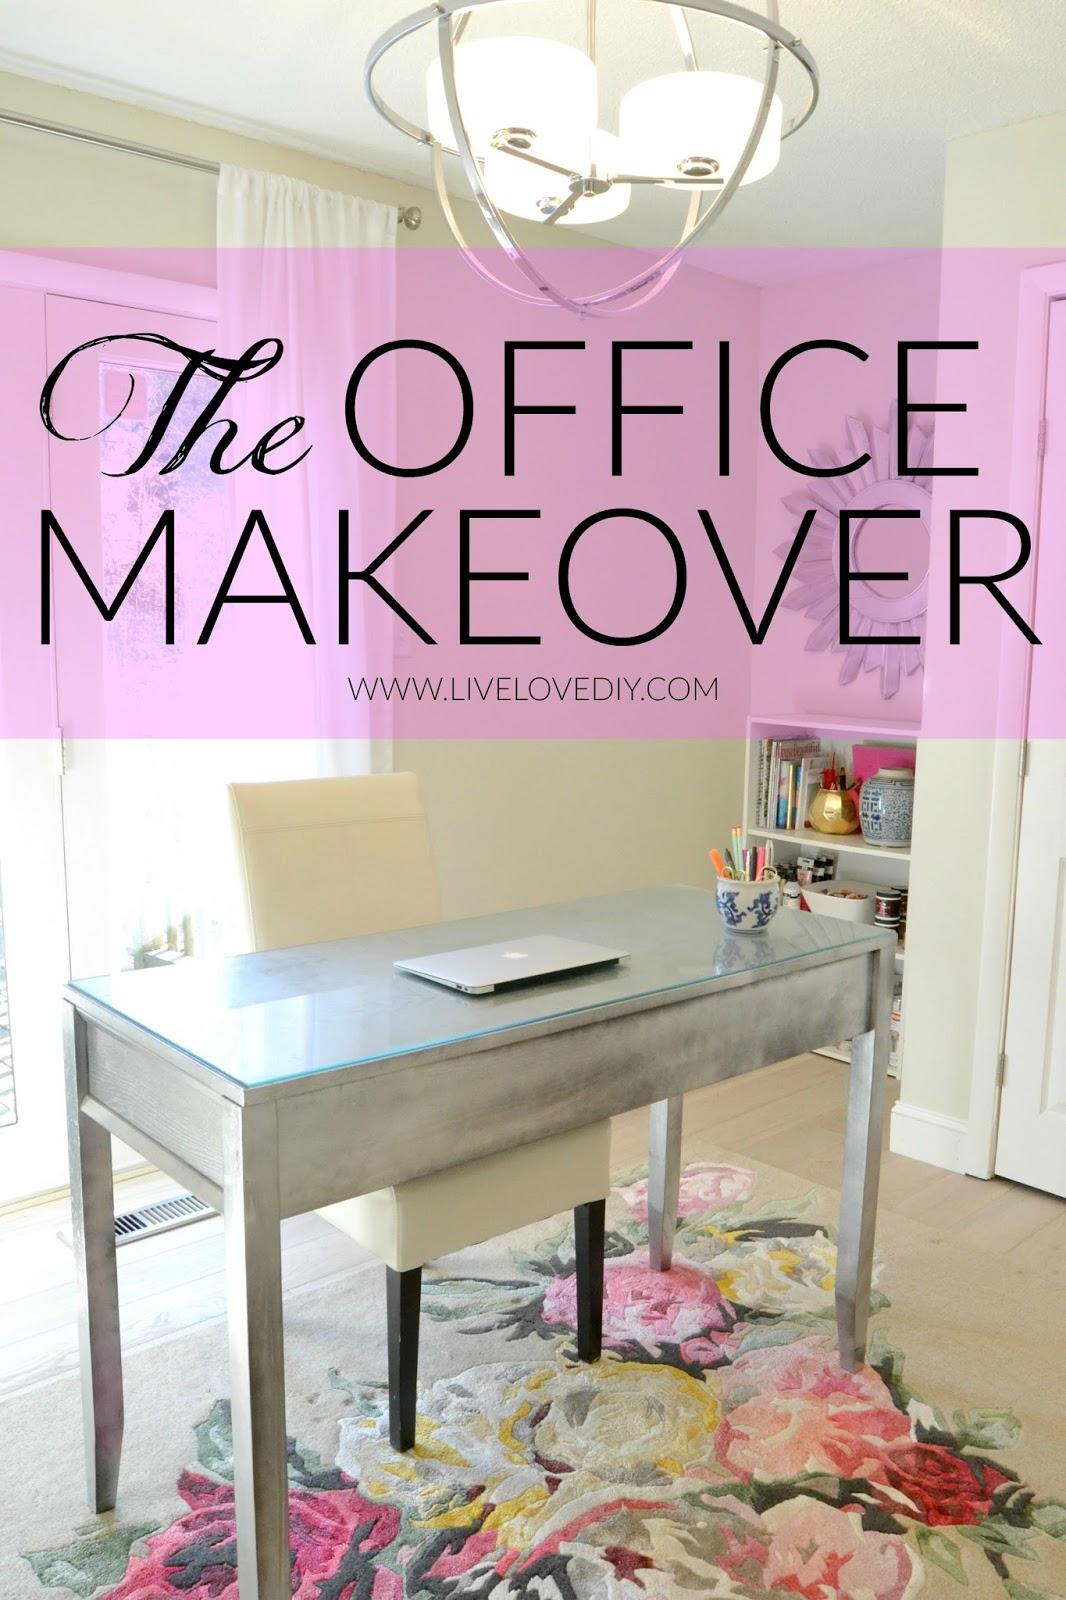 LiveLoveDIY: Home Office Decorating Ideas: My Latest